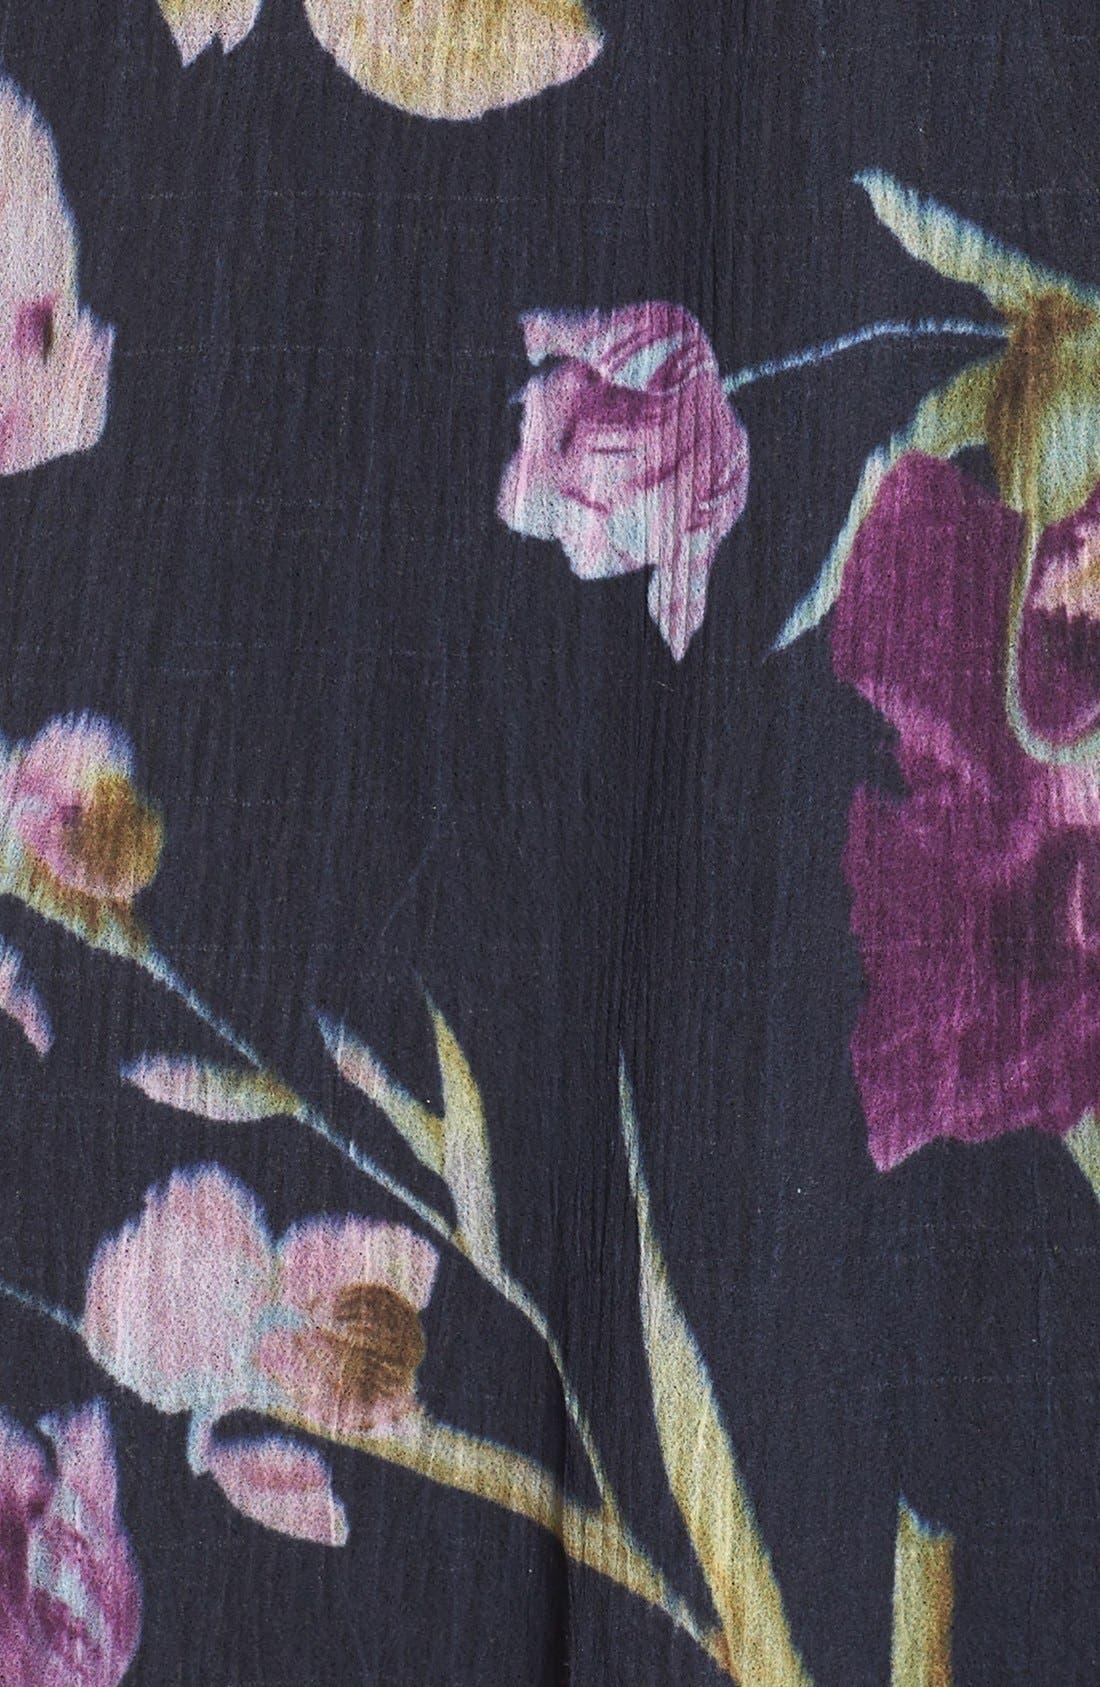 Floral Print Chiffon A-Line Dress,                             Alternate thumbnail 4, color,                             009